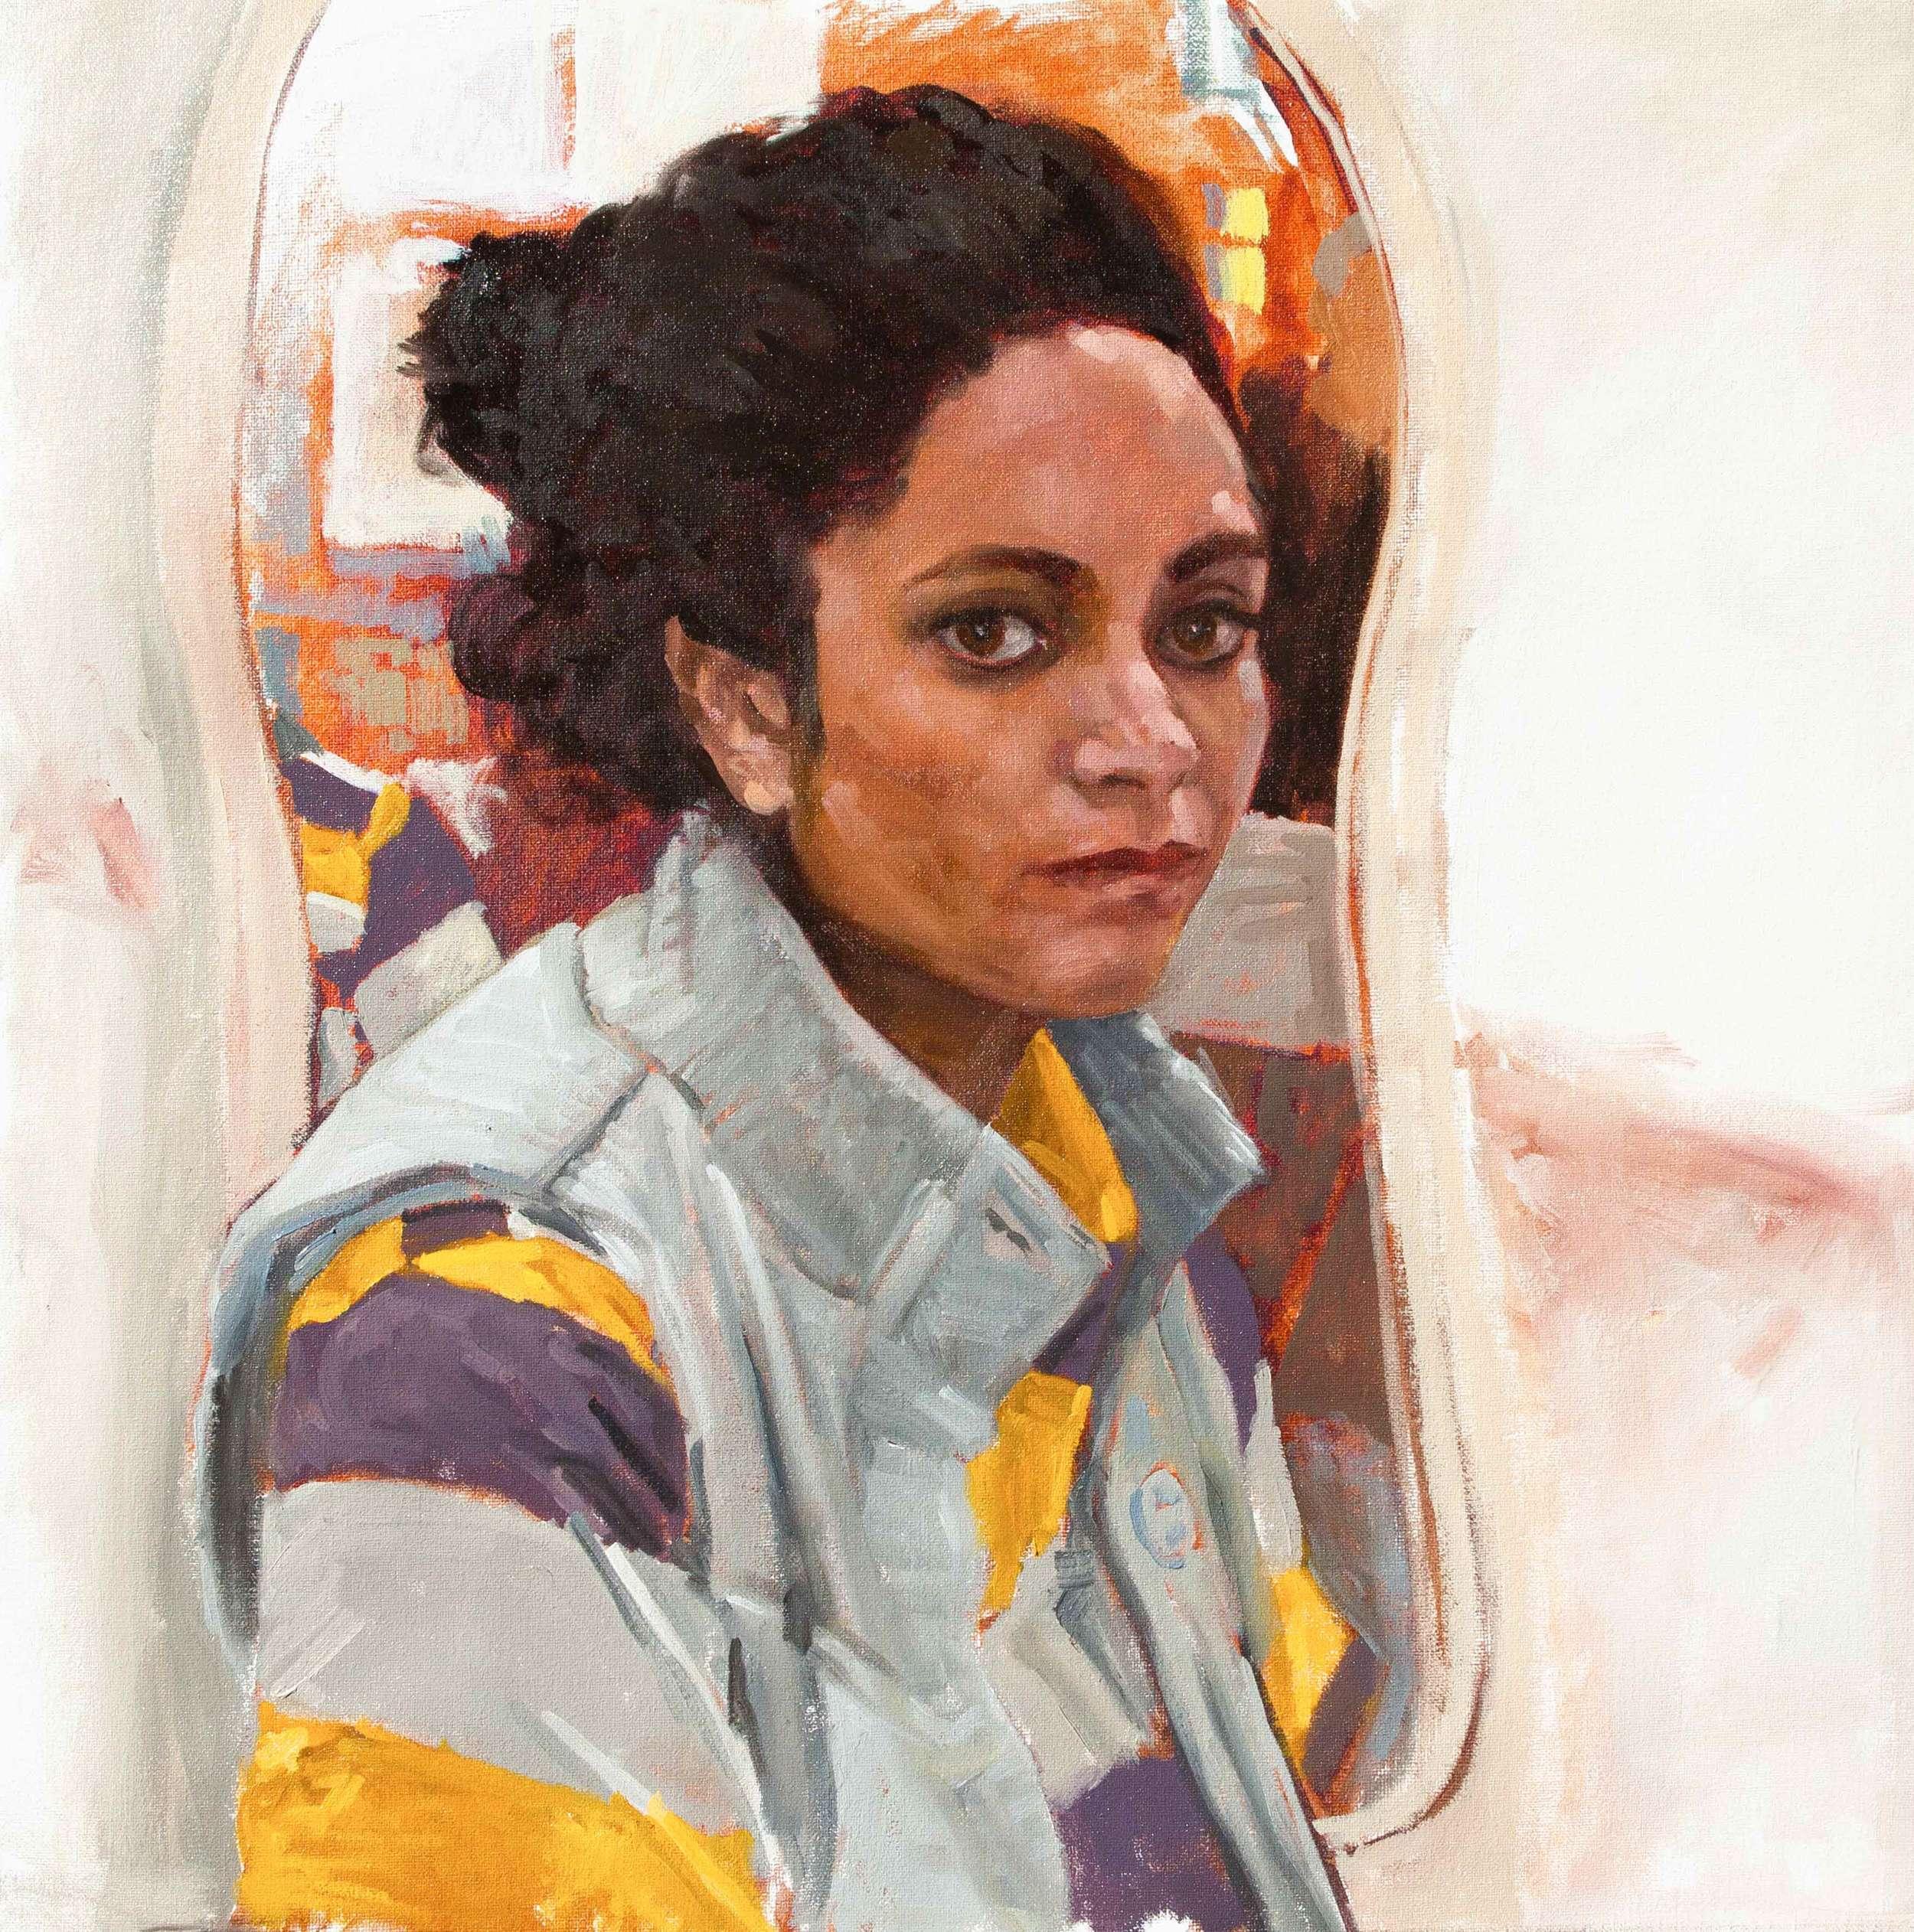 Soha Oil on canvas